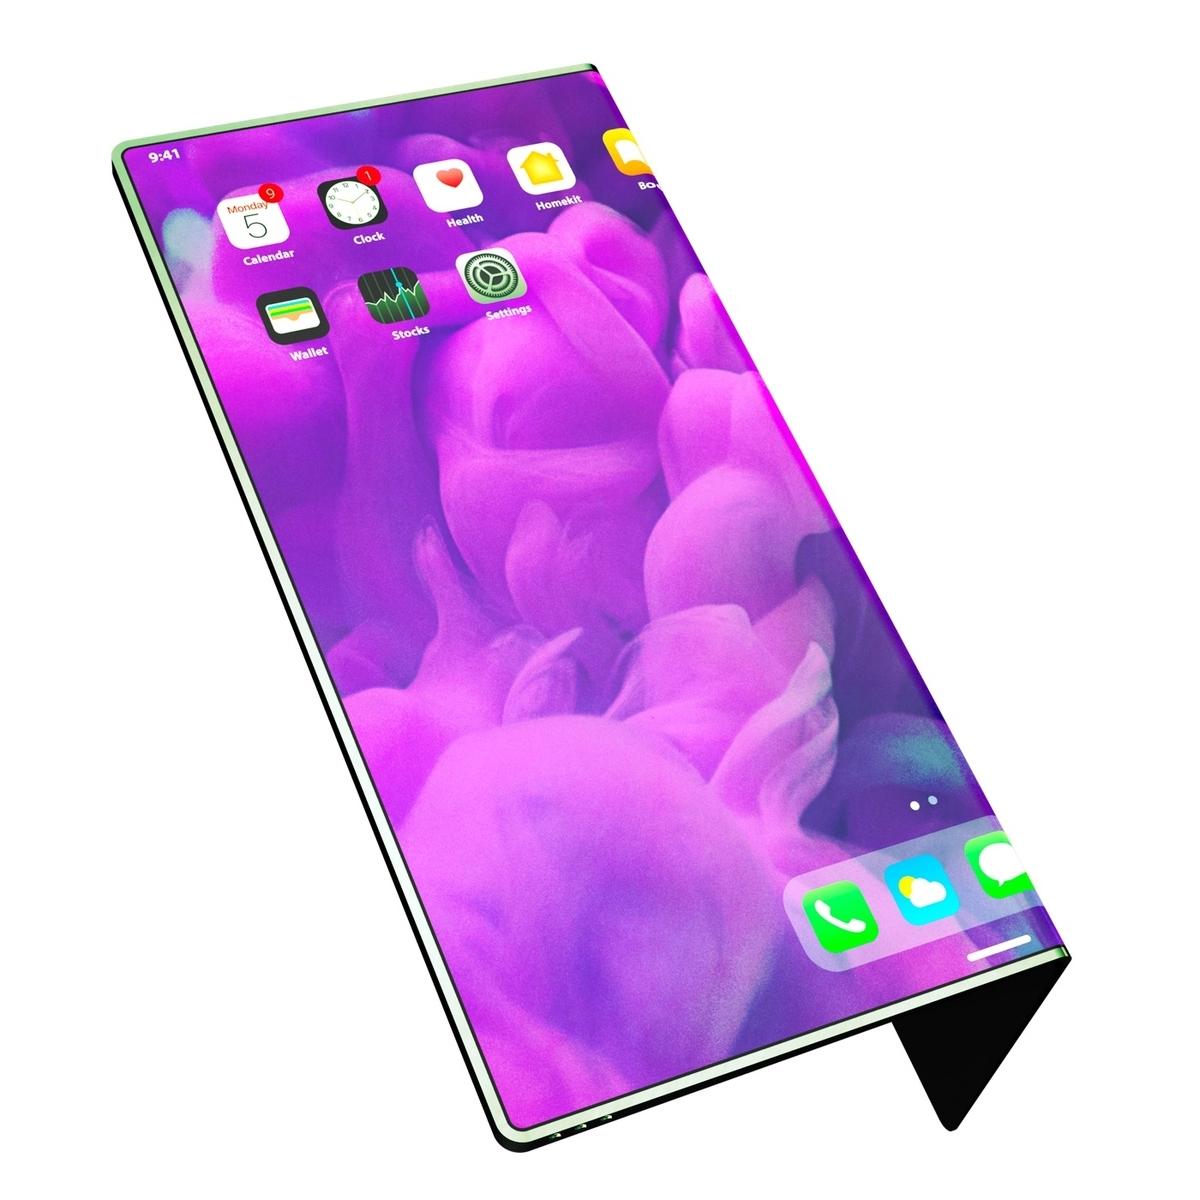 APPLE iPhone Fold Concept Phone